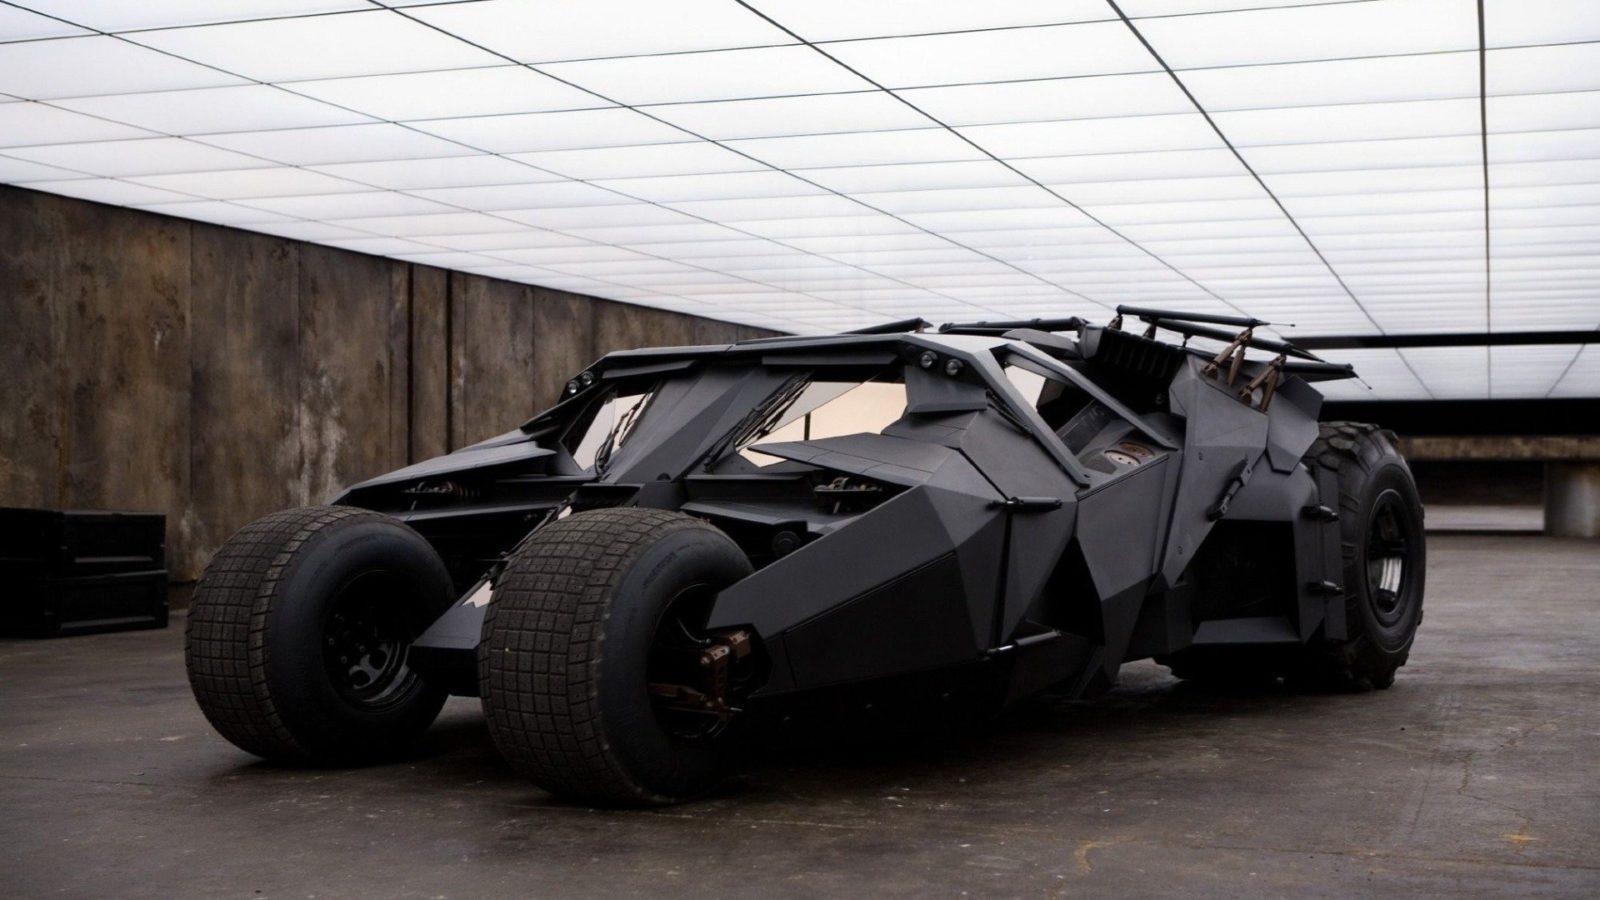 batman-batmobile-car